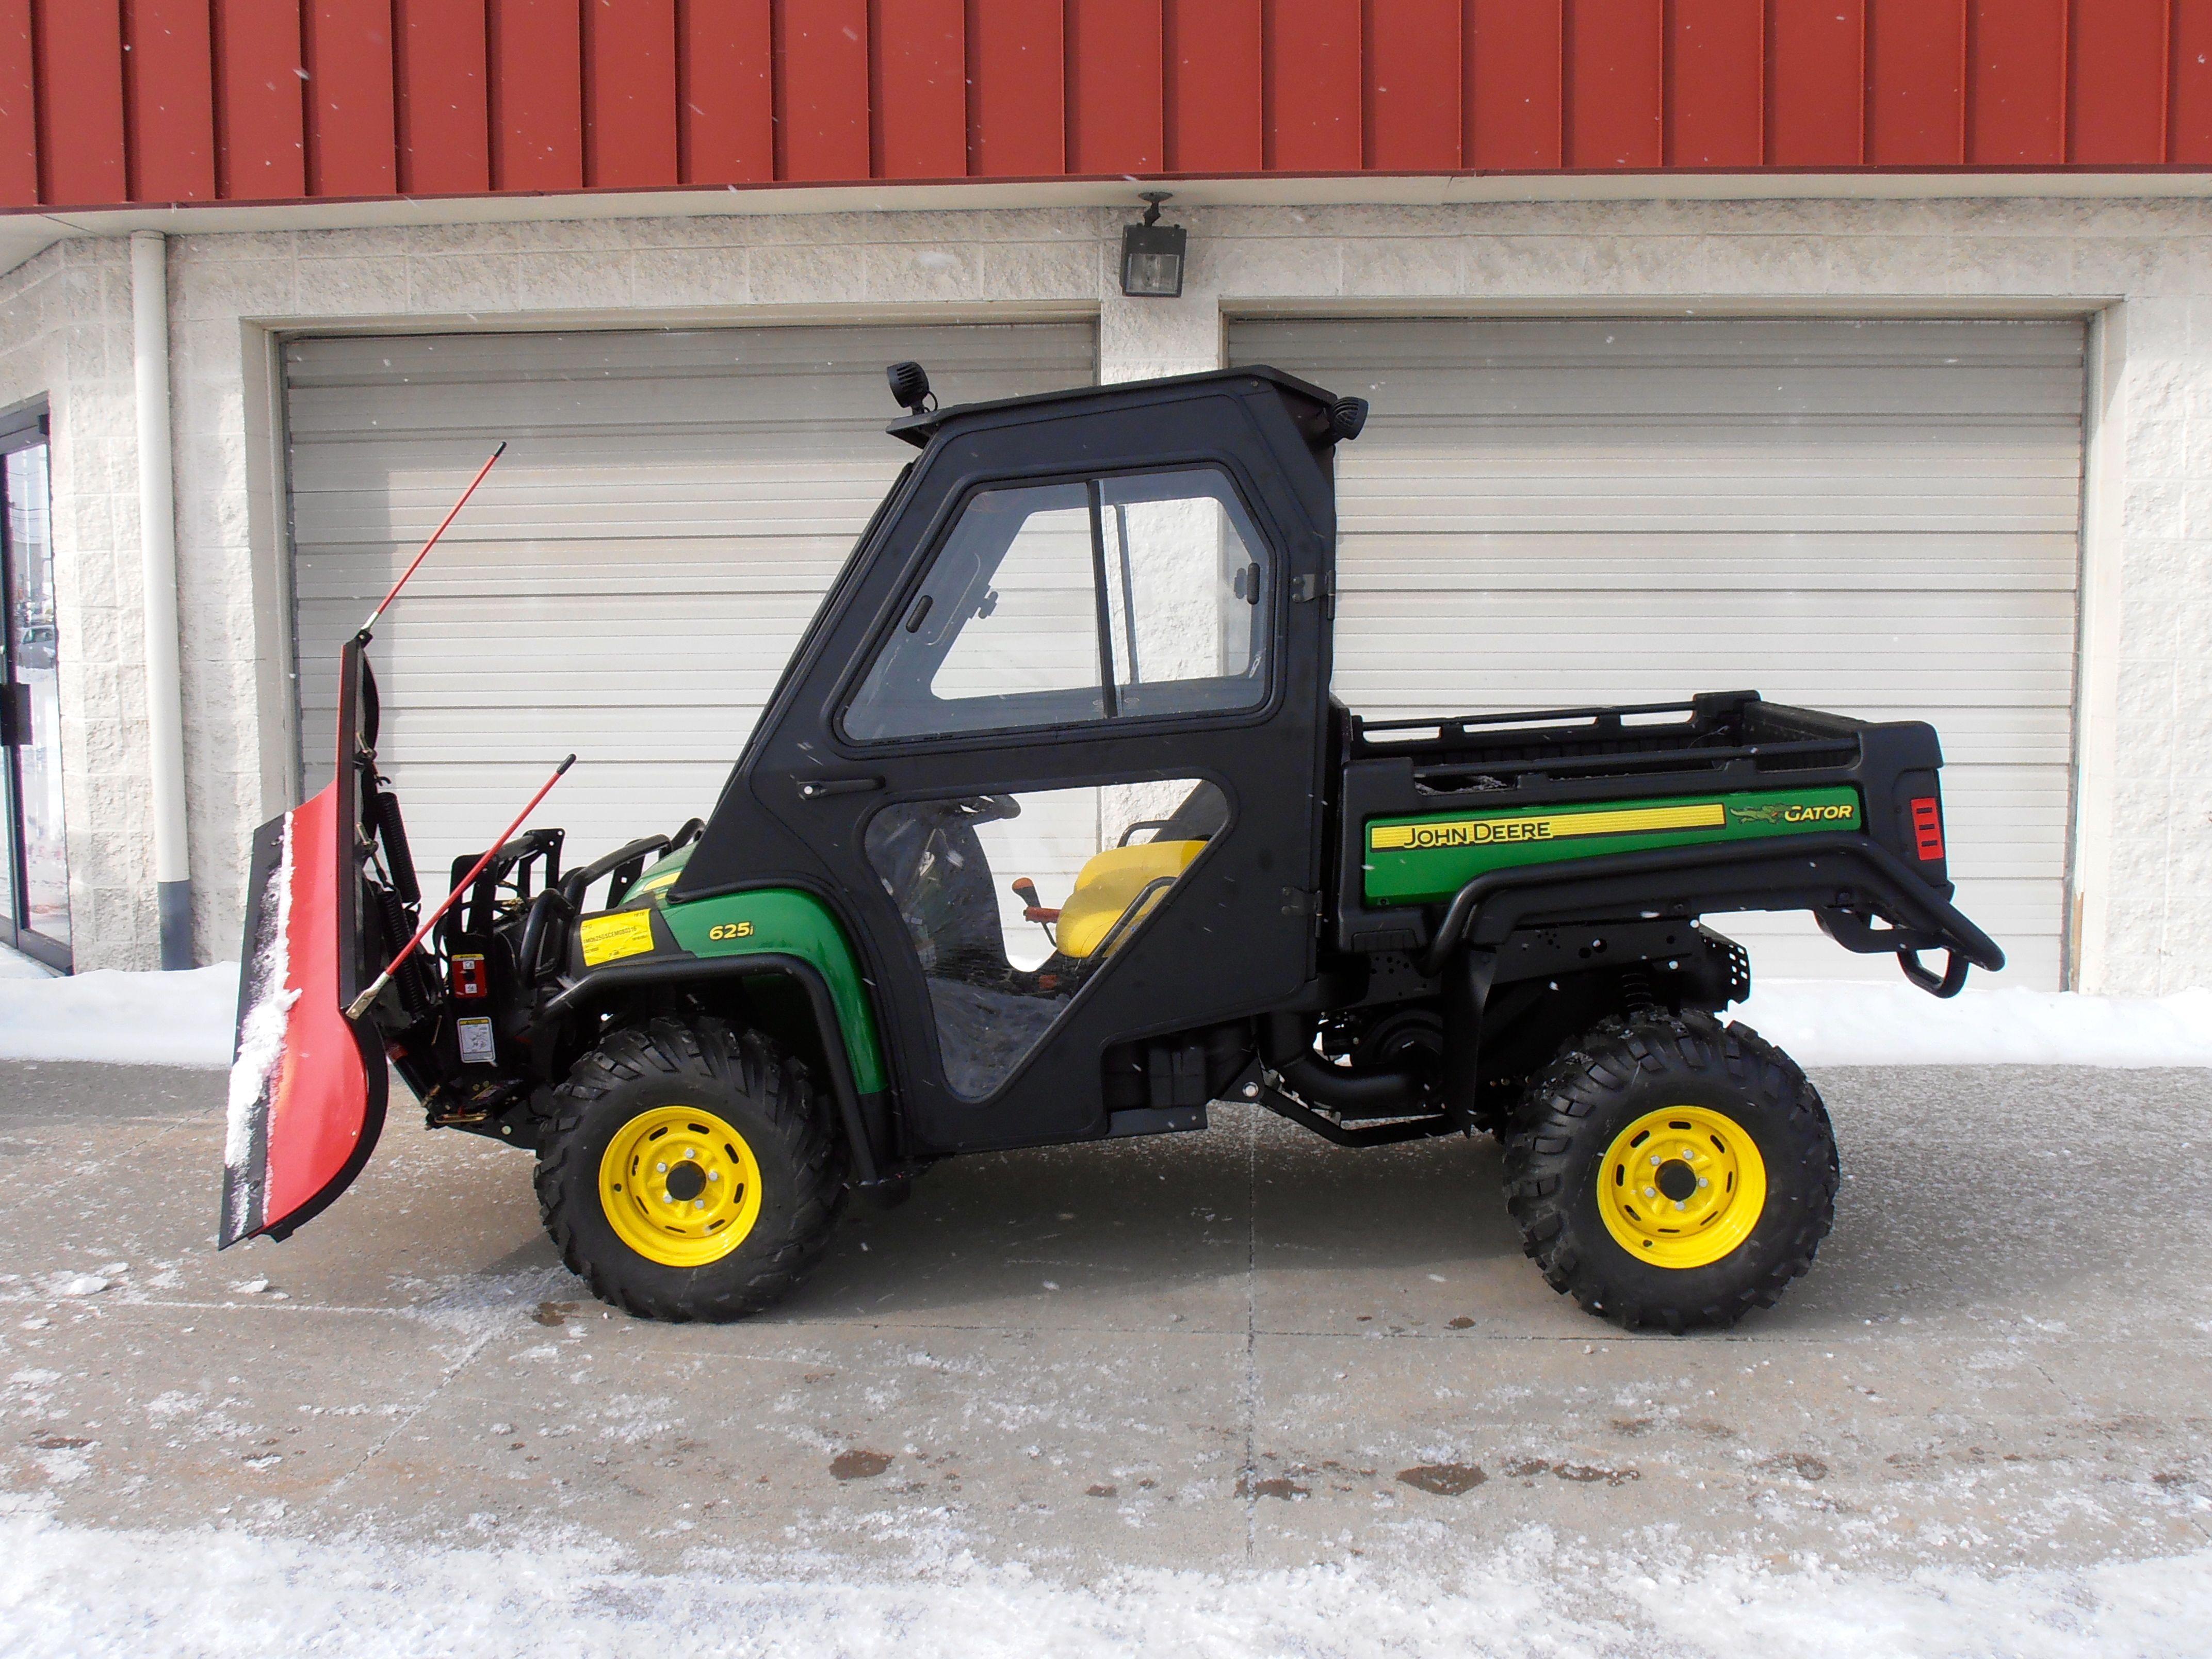 John Deere Snow Plow : John deere xuv i gator w cab boss front snow blade